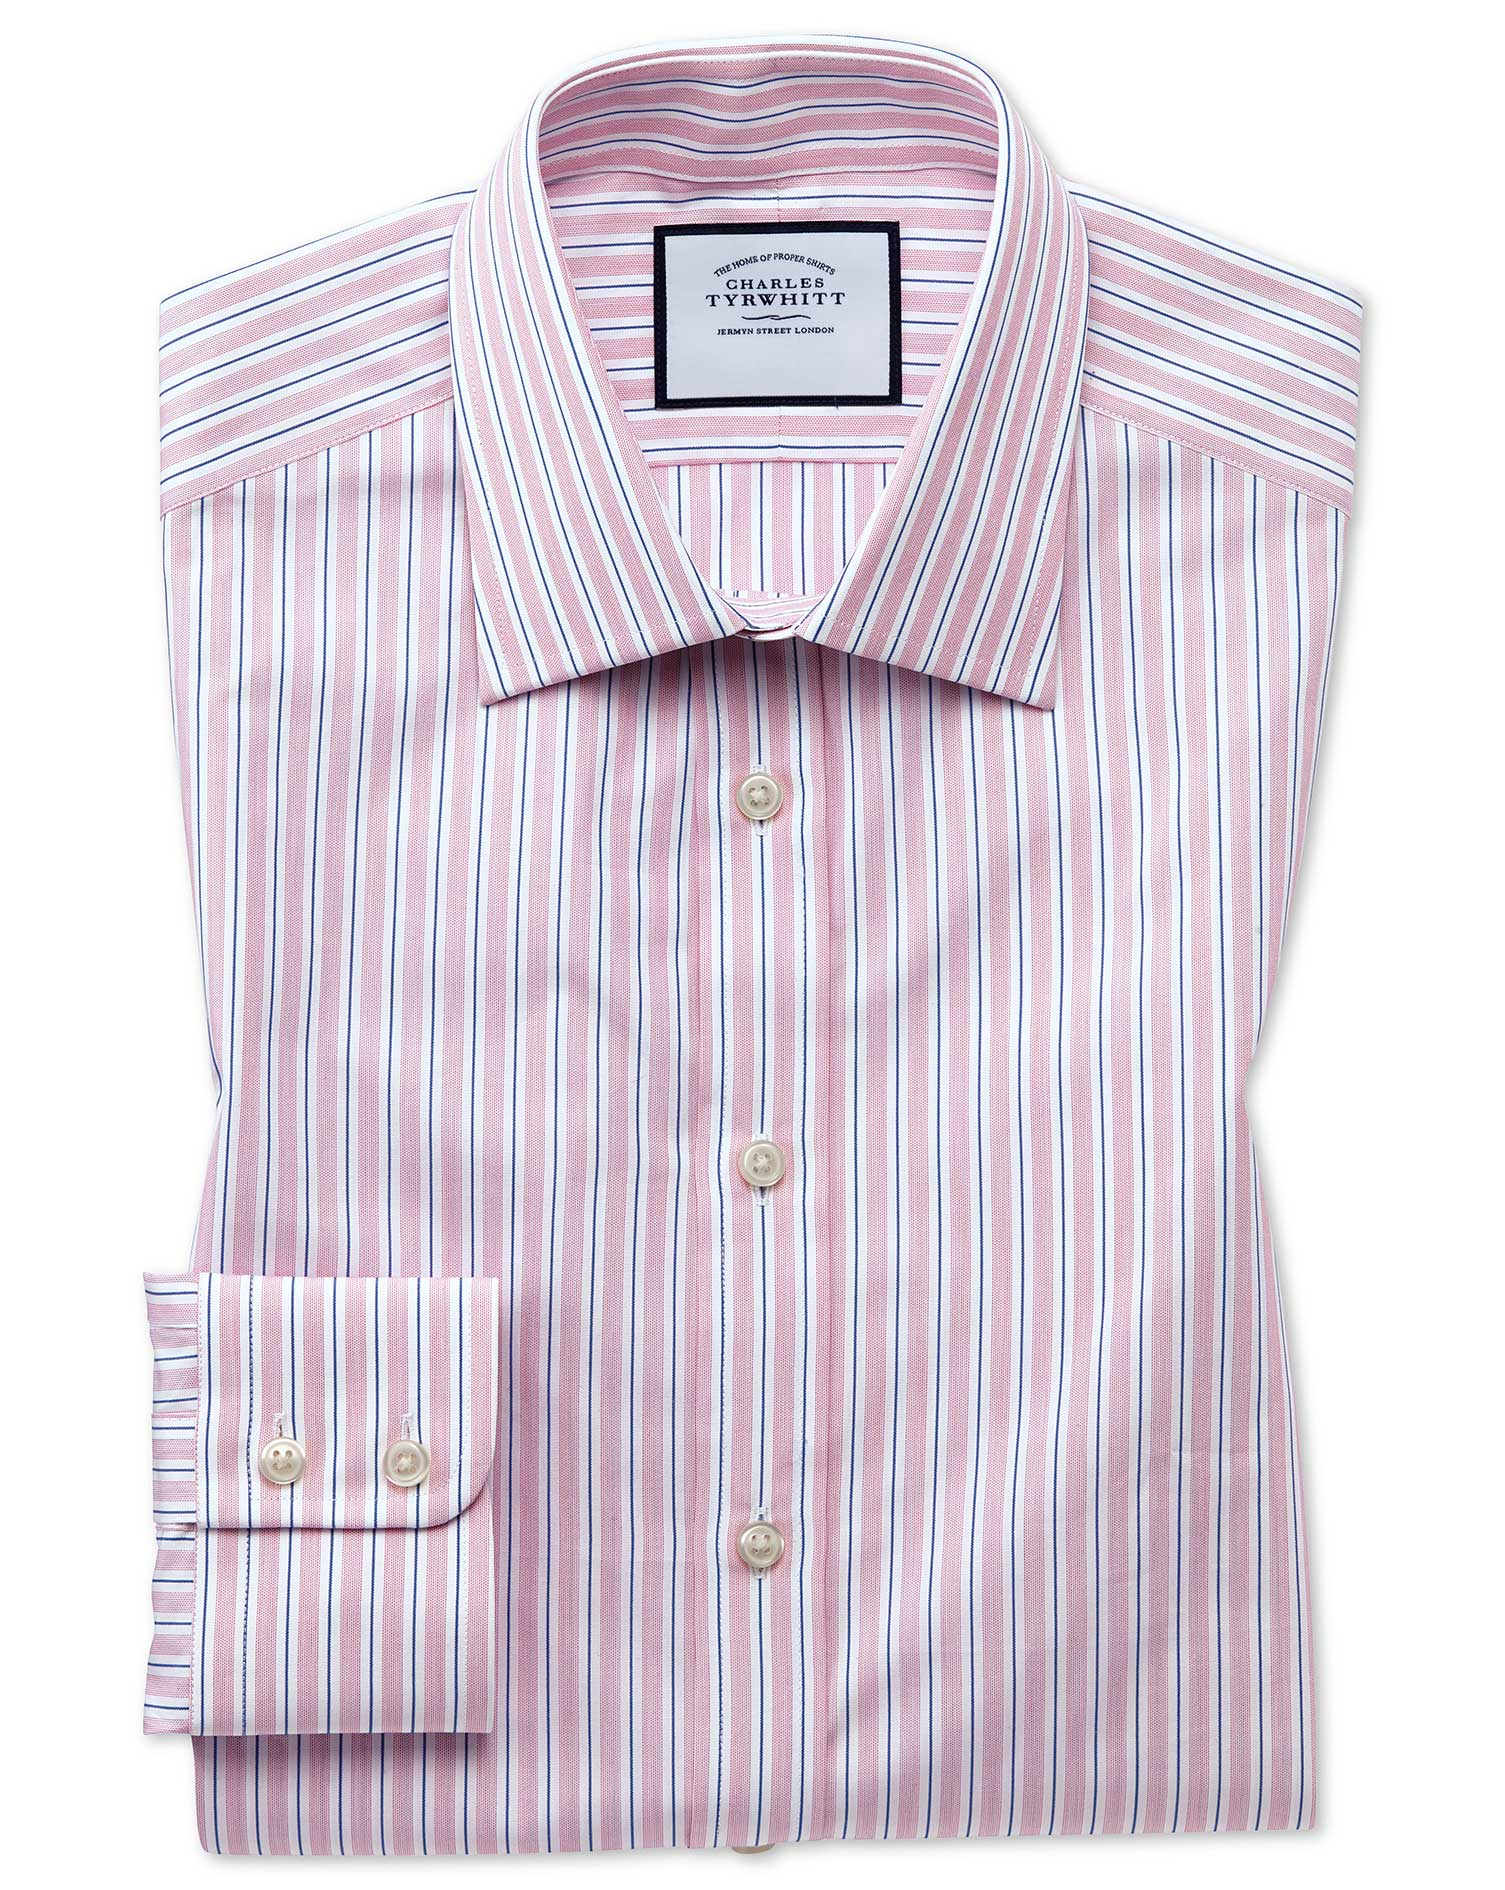 Slim Fit Egyptian Cotton Poplin Pink Stripe Formal Shirt Single Cuff Size 18/37 by Charles Tyrwhitt